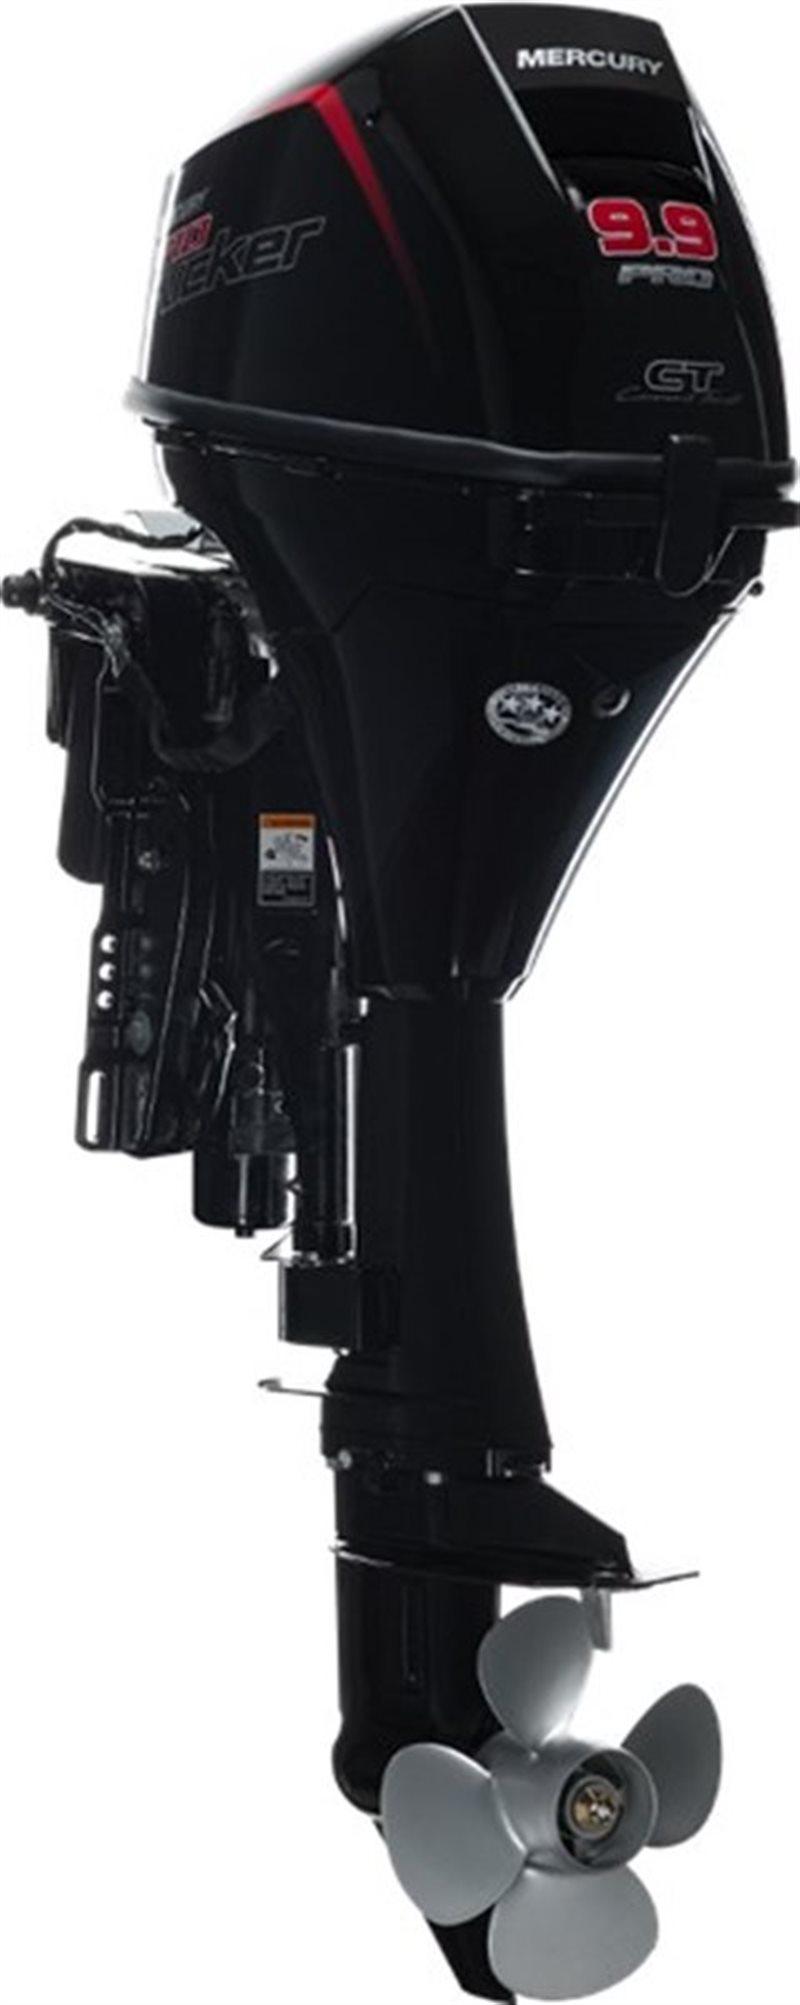 99 hp EFI ProKicker at Jacksonville Powersports, Jacksonville, FL 32225